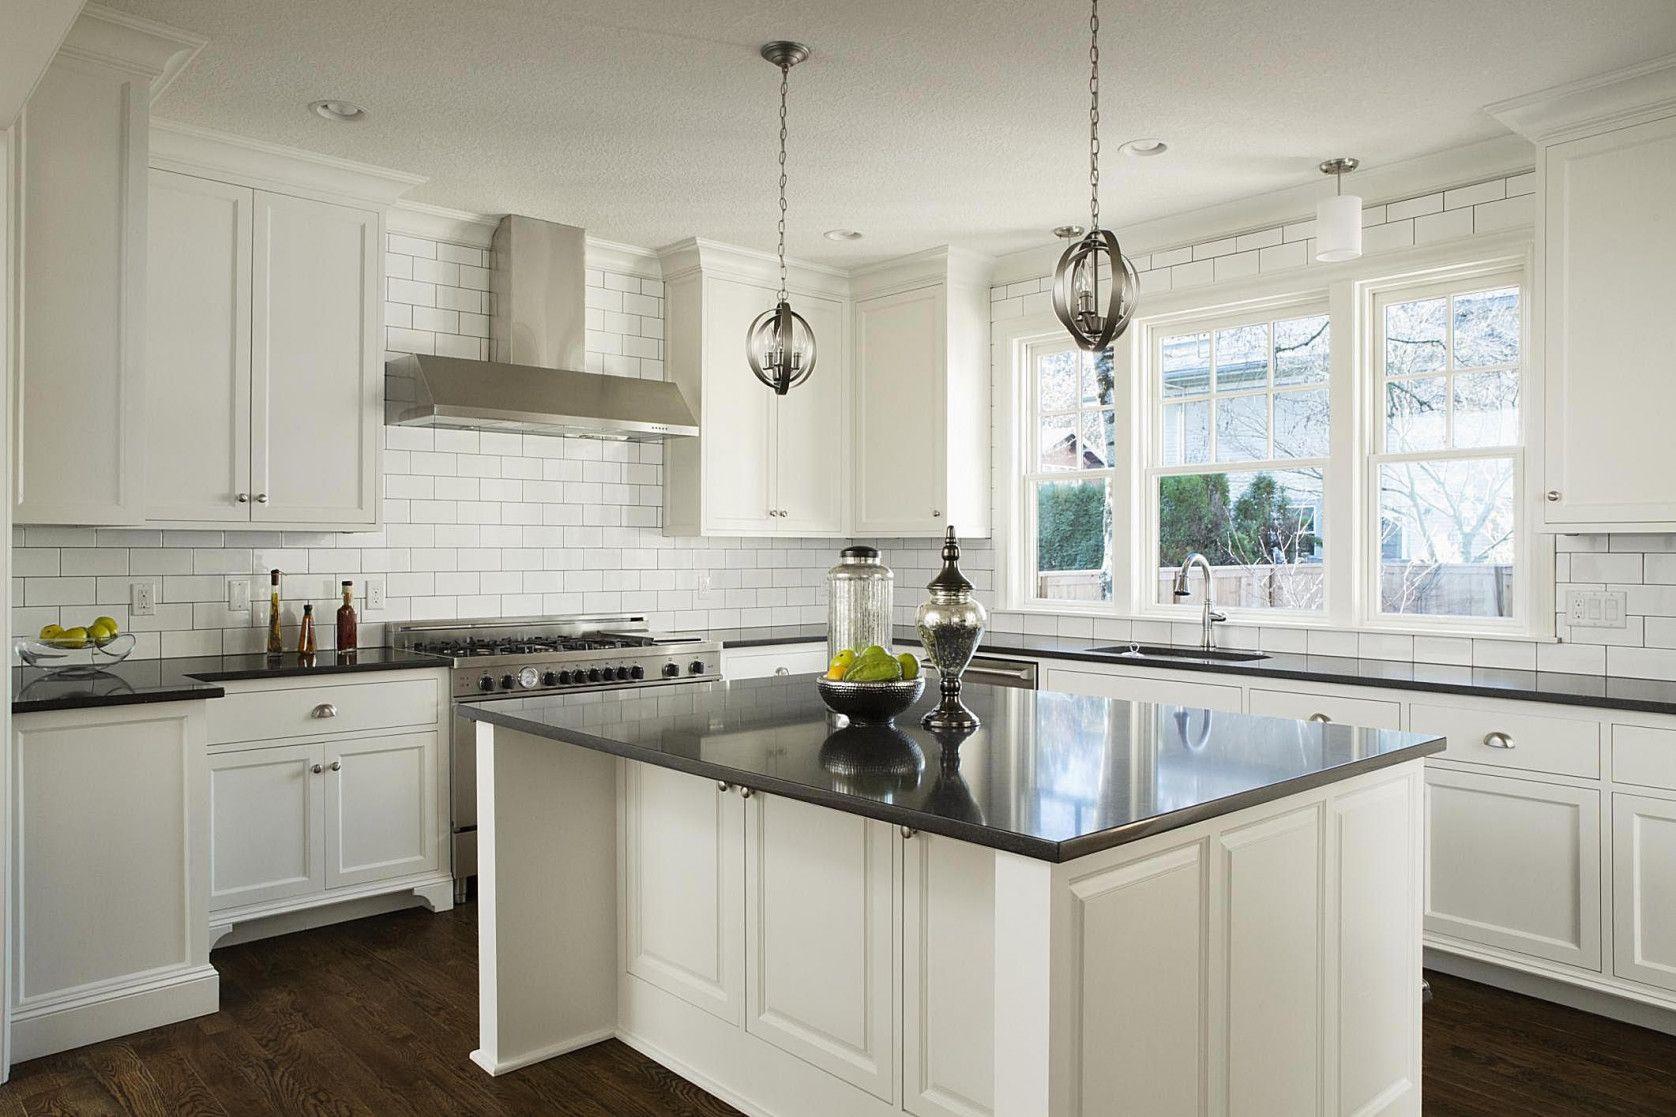 77+ Ready to Build Kitchen Cabinets - Best Kitchen Cabinet Ideas ...